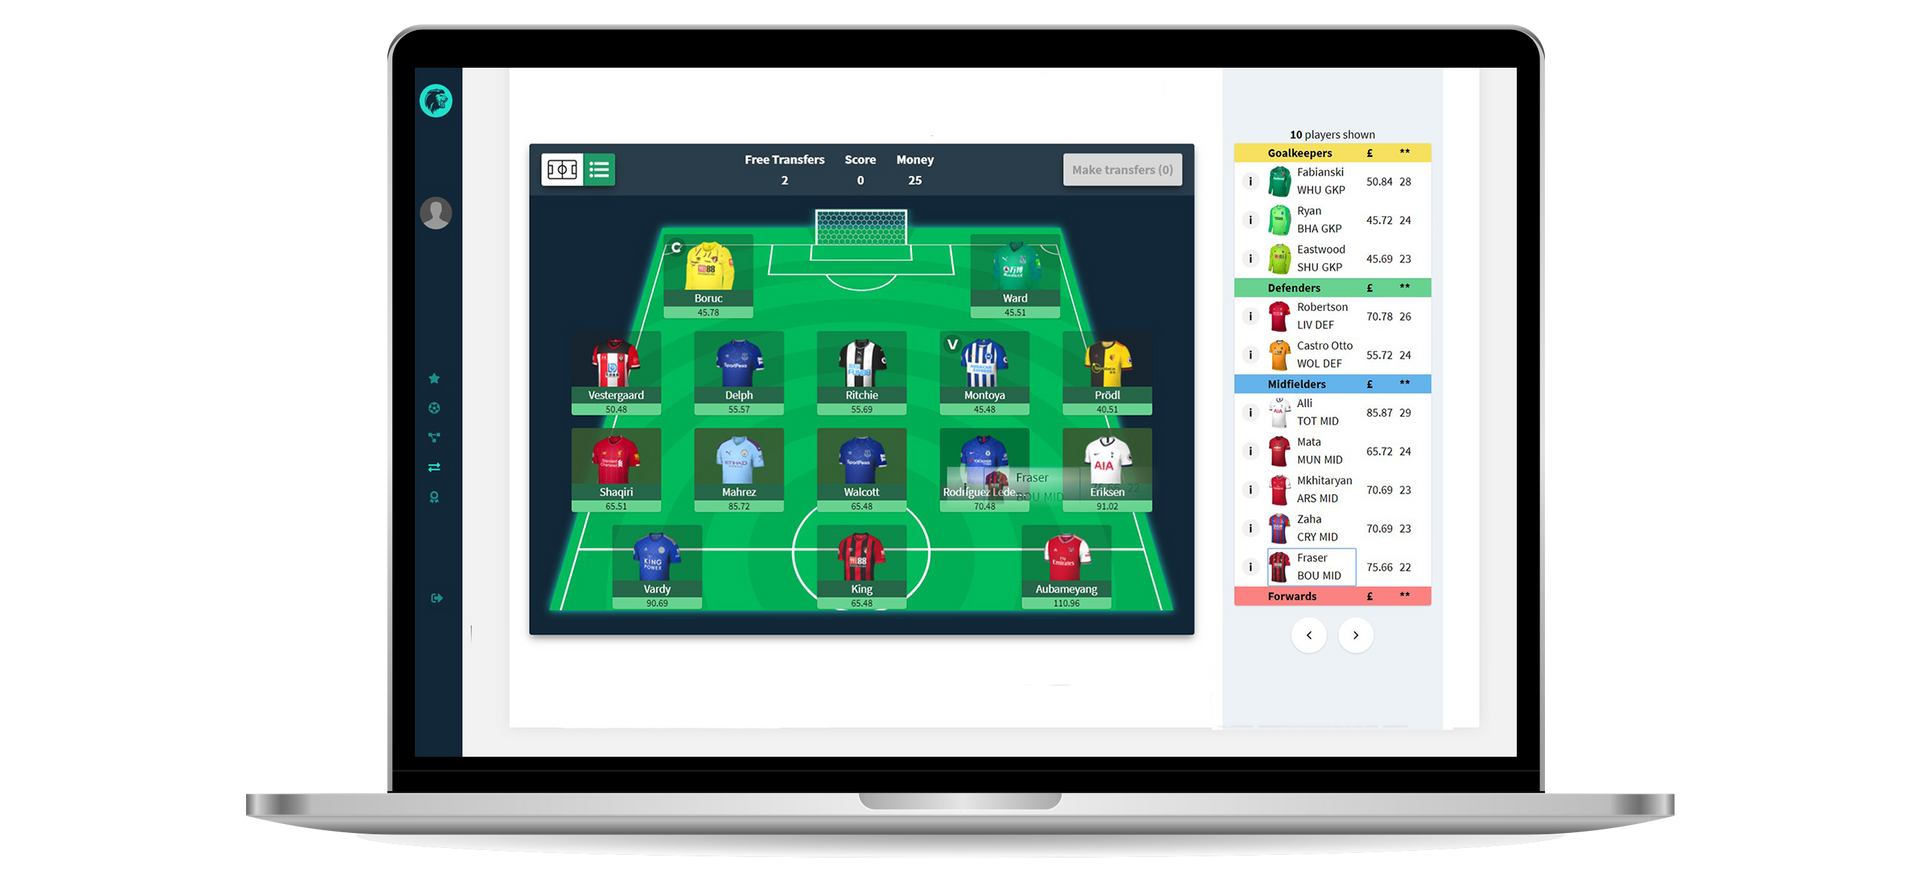 Sports App Lineup